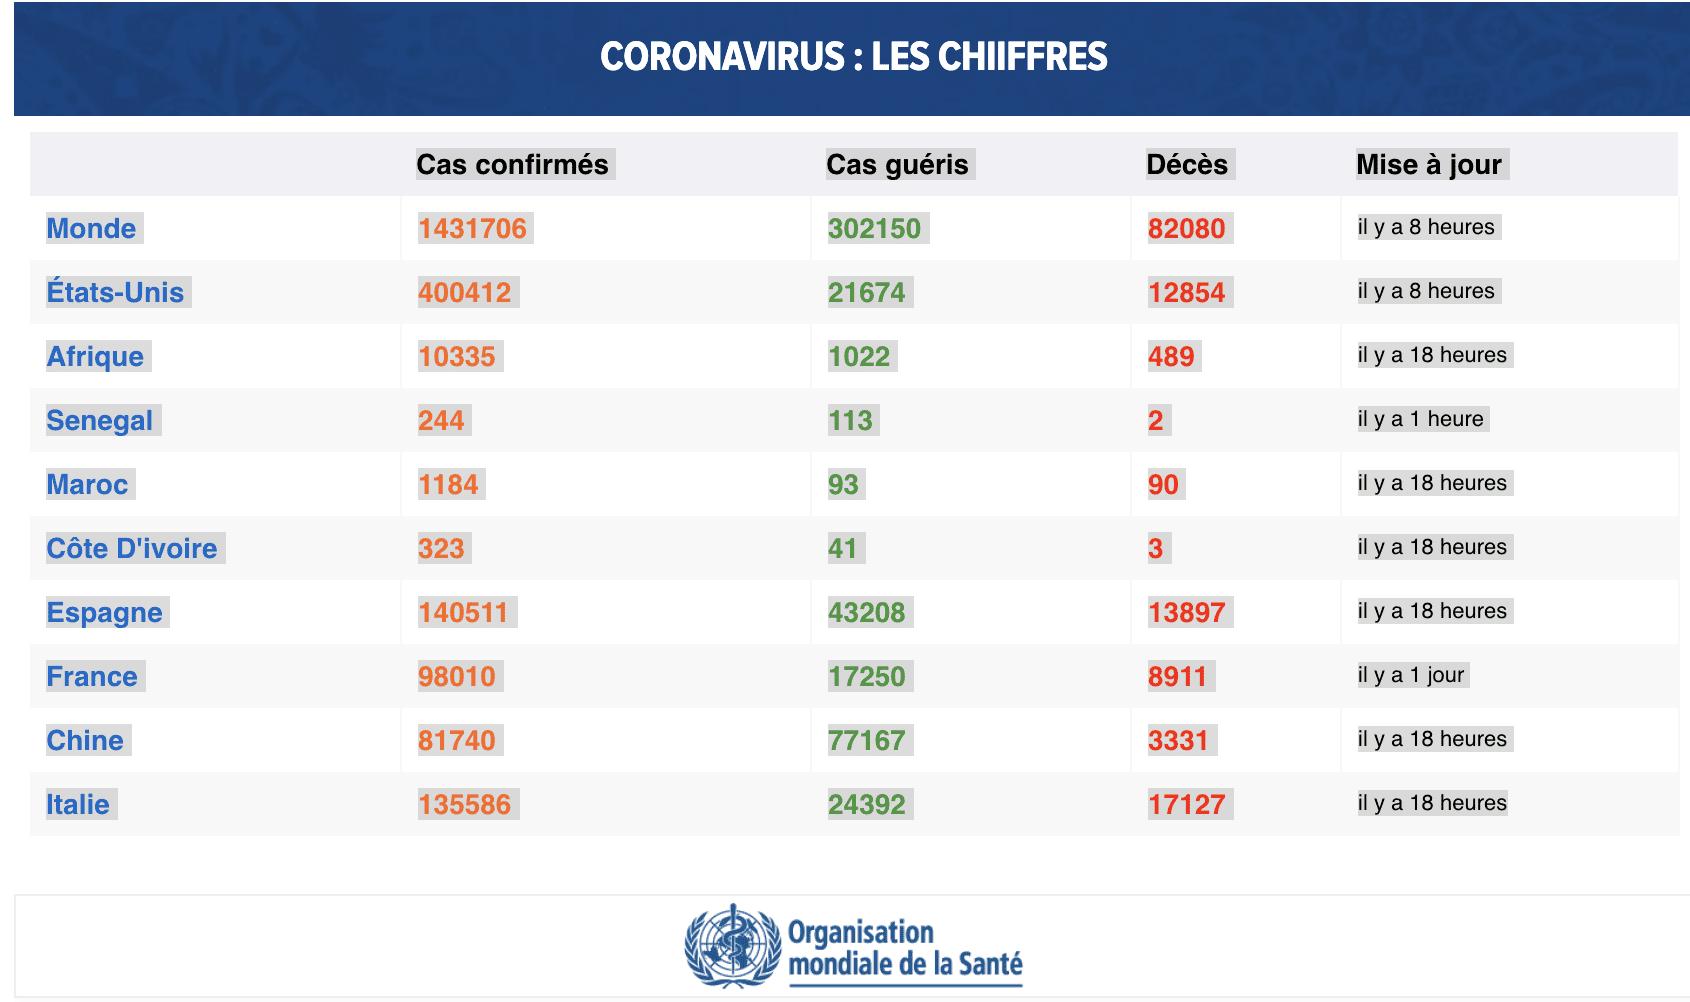 CORONAVIRUS : LES CHIIFFRES